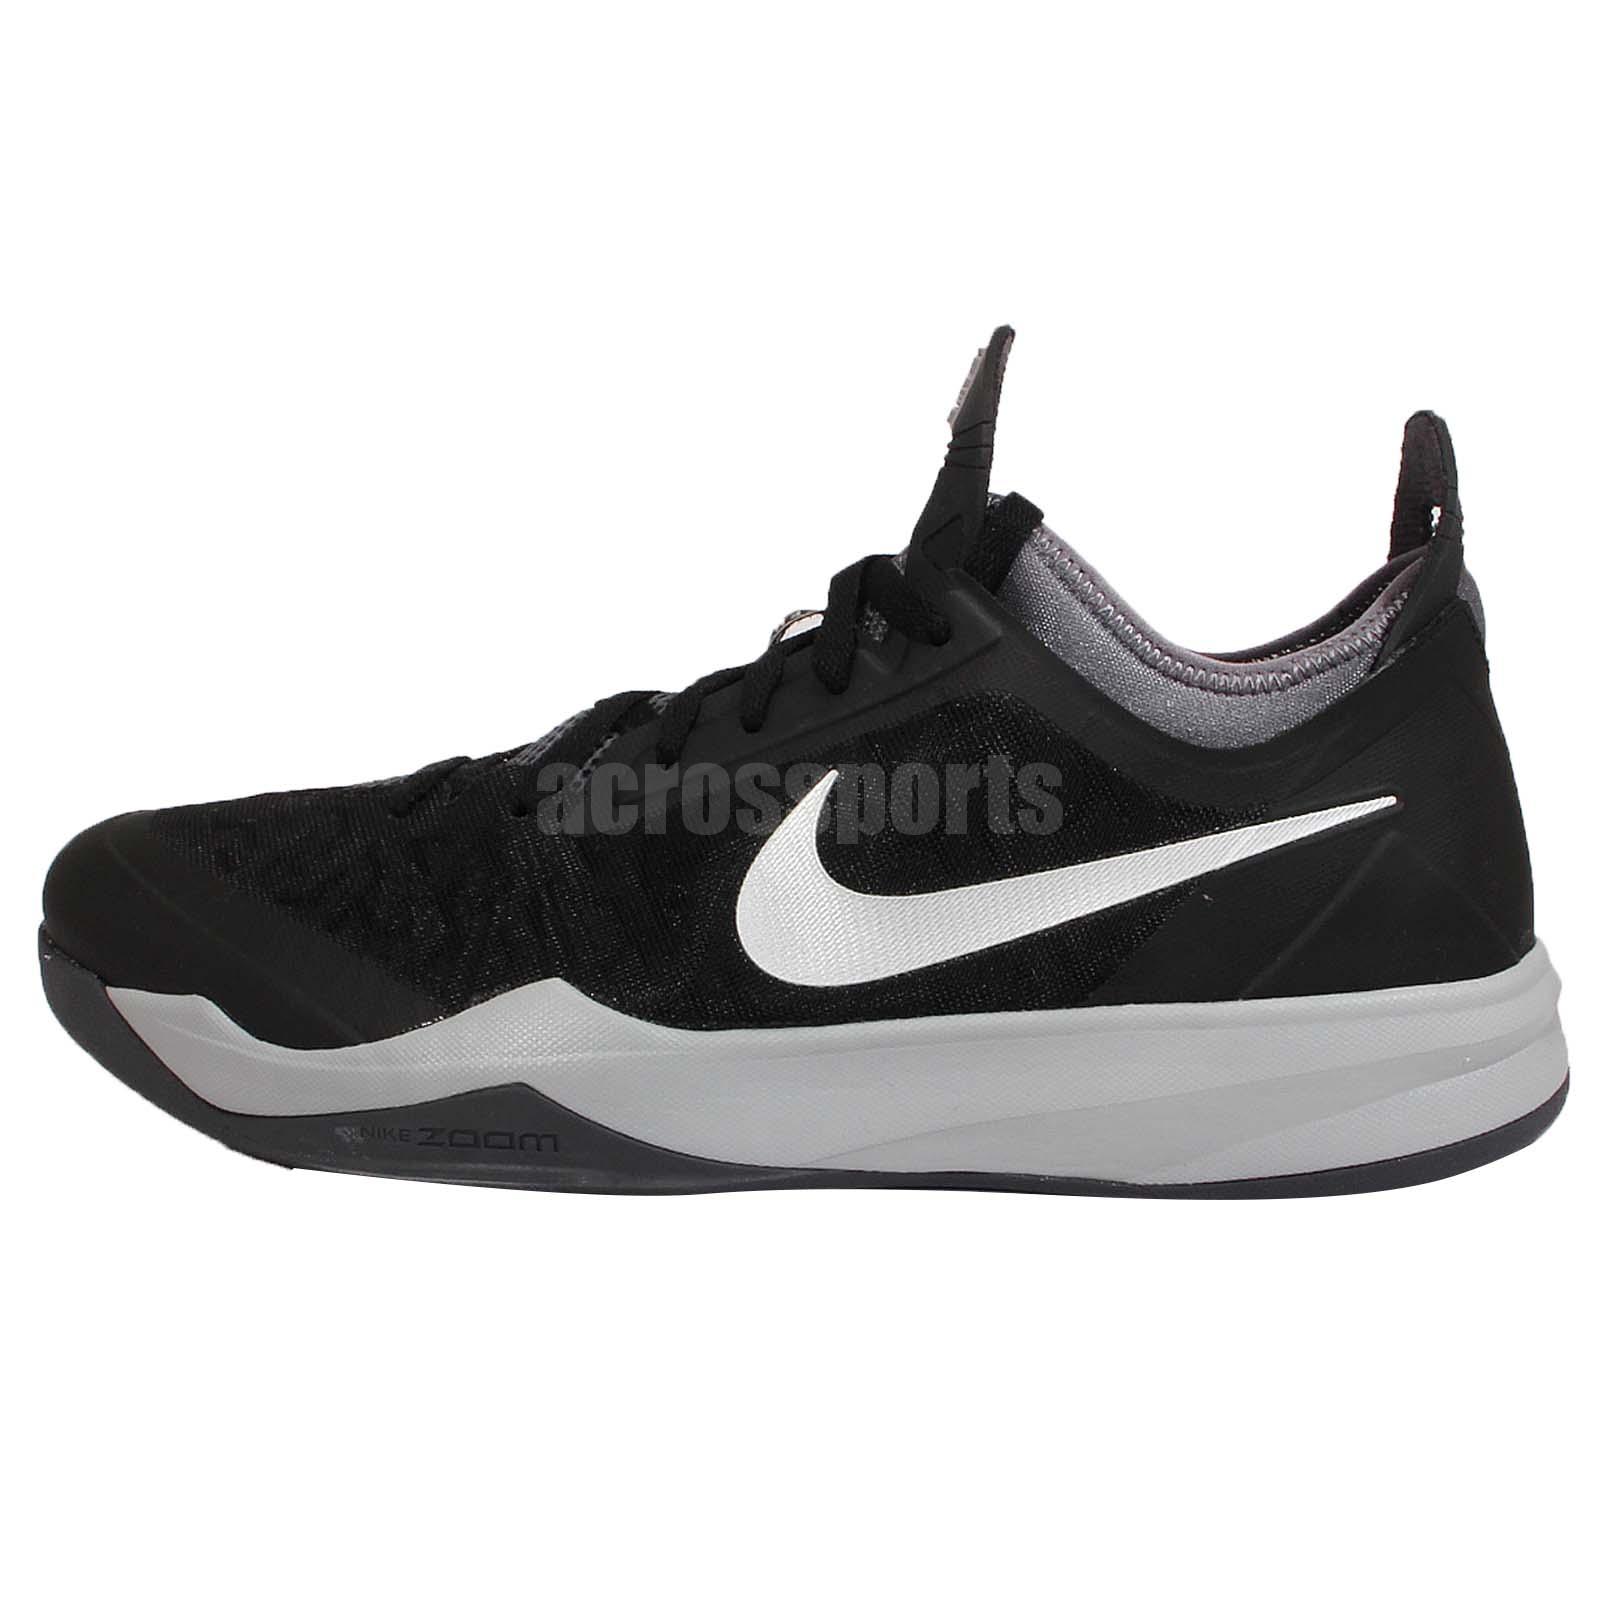 James Harden Nike Shoes: James Harden Nike Shoes 2015